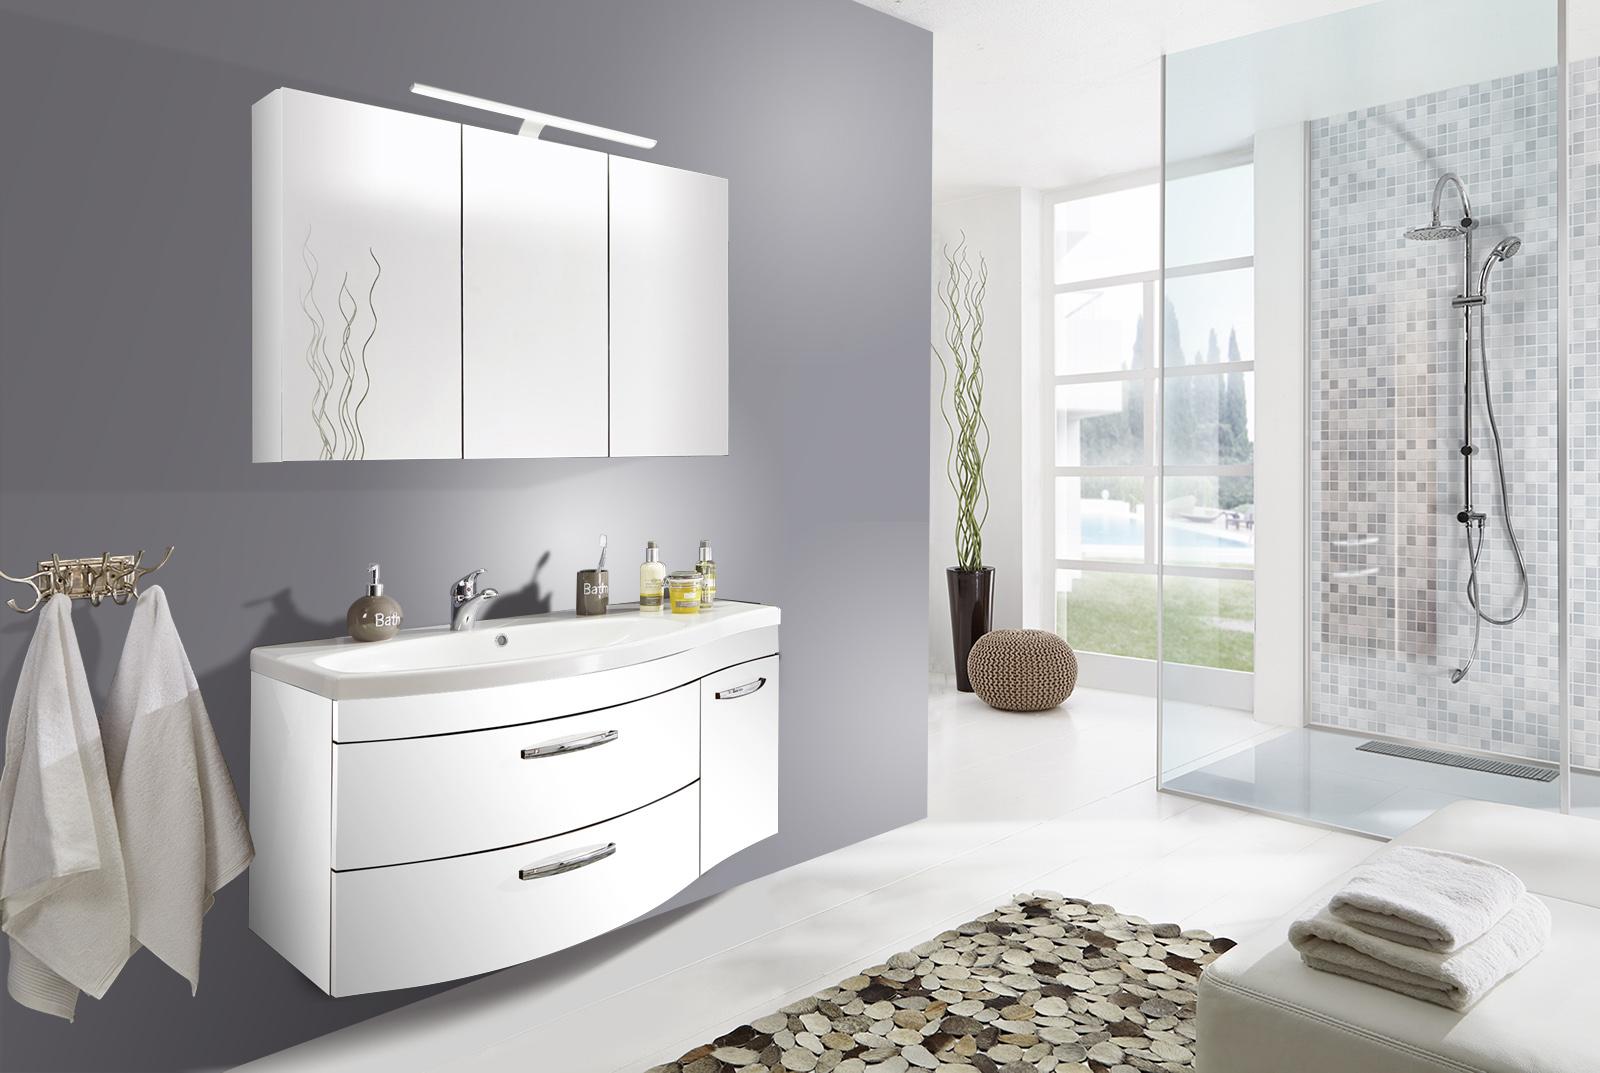 sam badm bel set 2tlg waschtisch 110 cm wei matt vena links. Black Bedroom Furniture Sets. Home Design Ideas